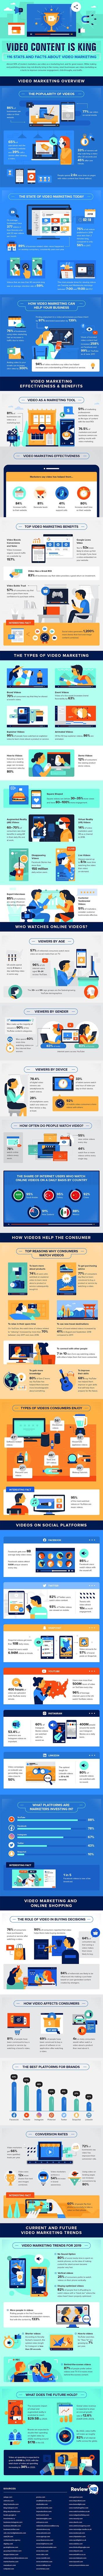 147+ Video Marketing Statistics #infographic